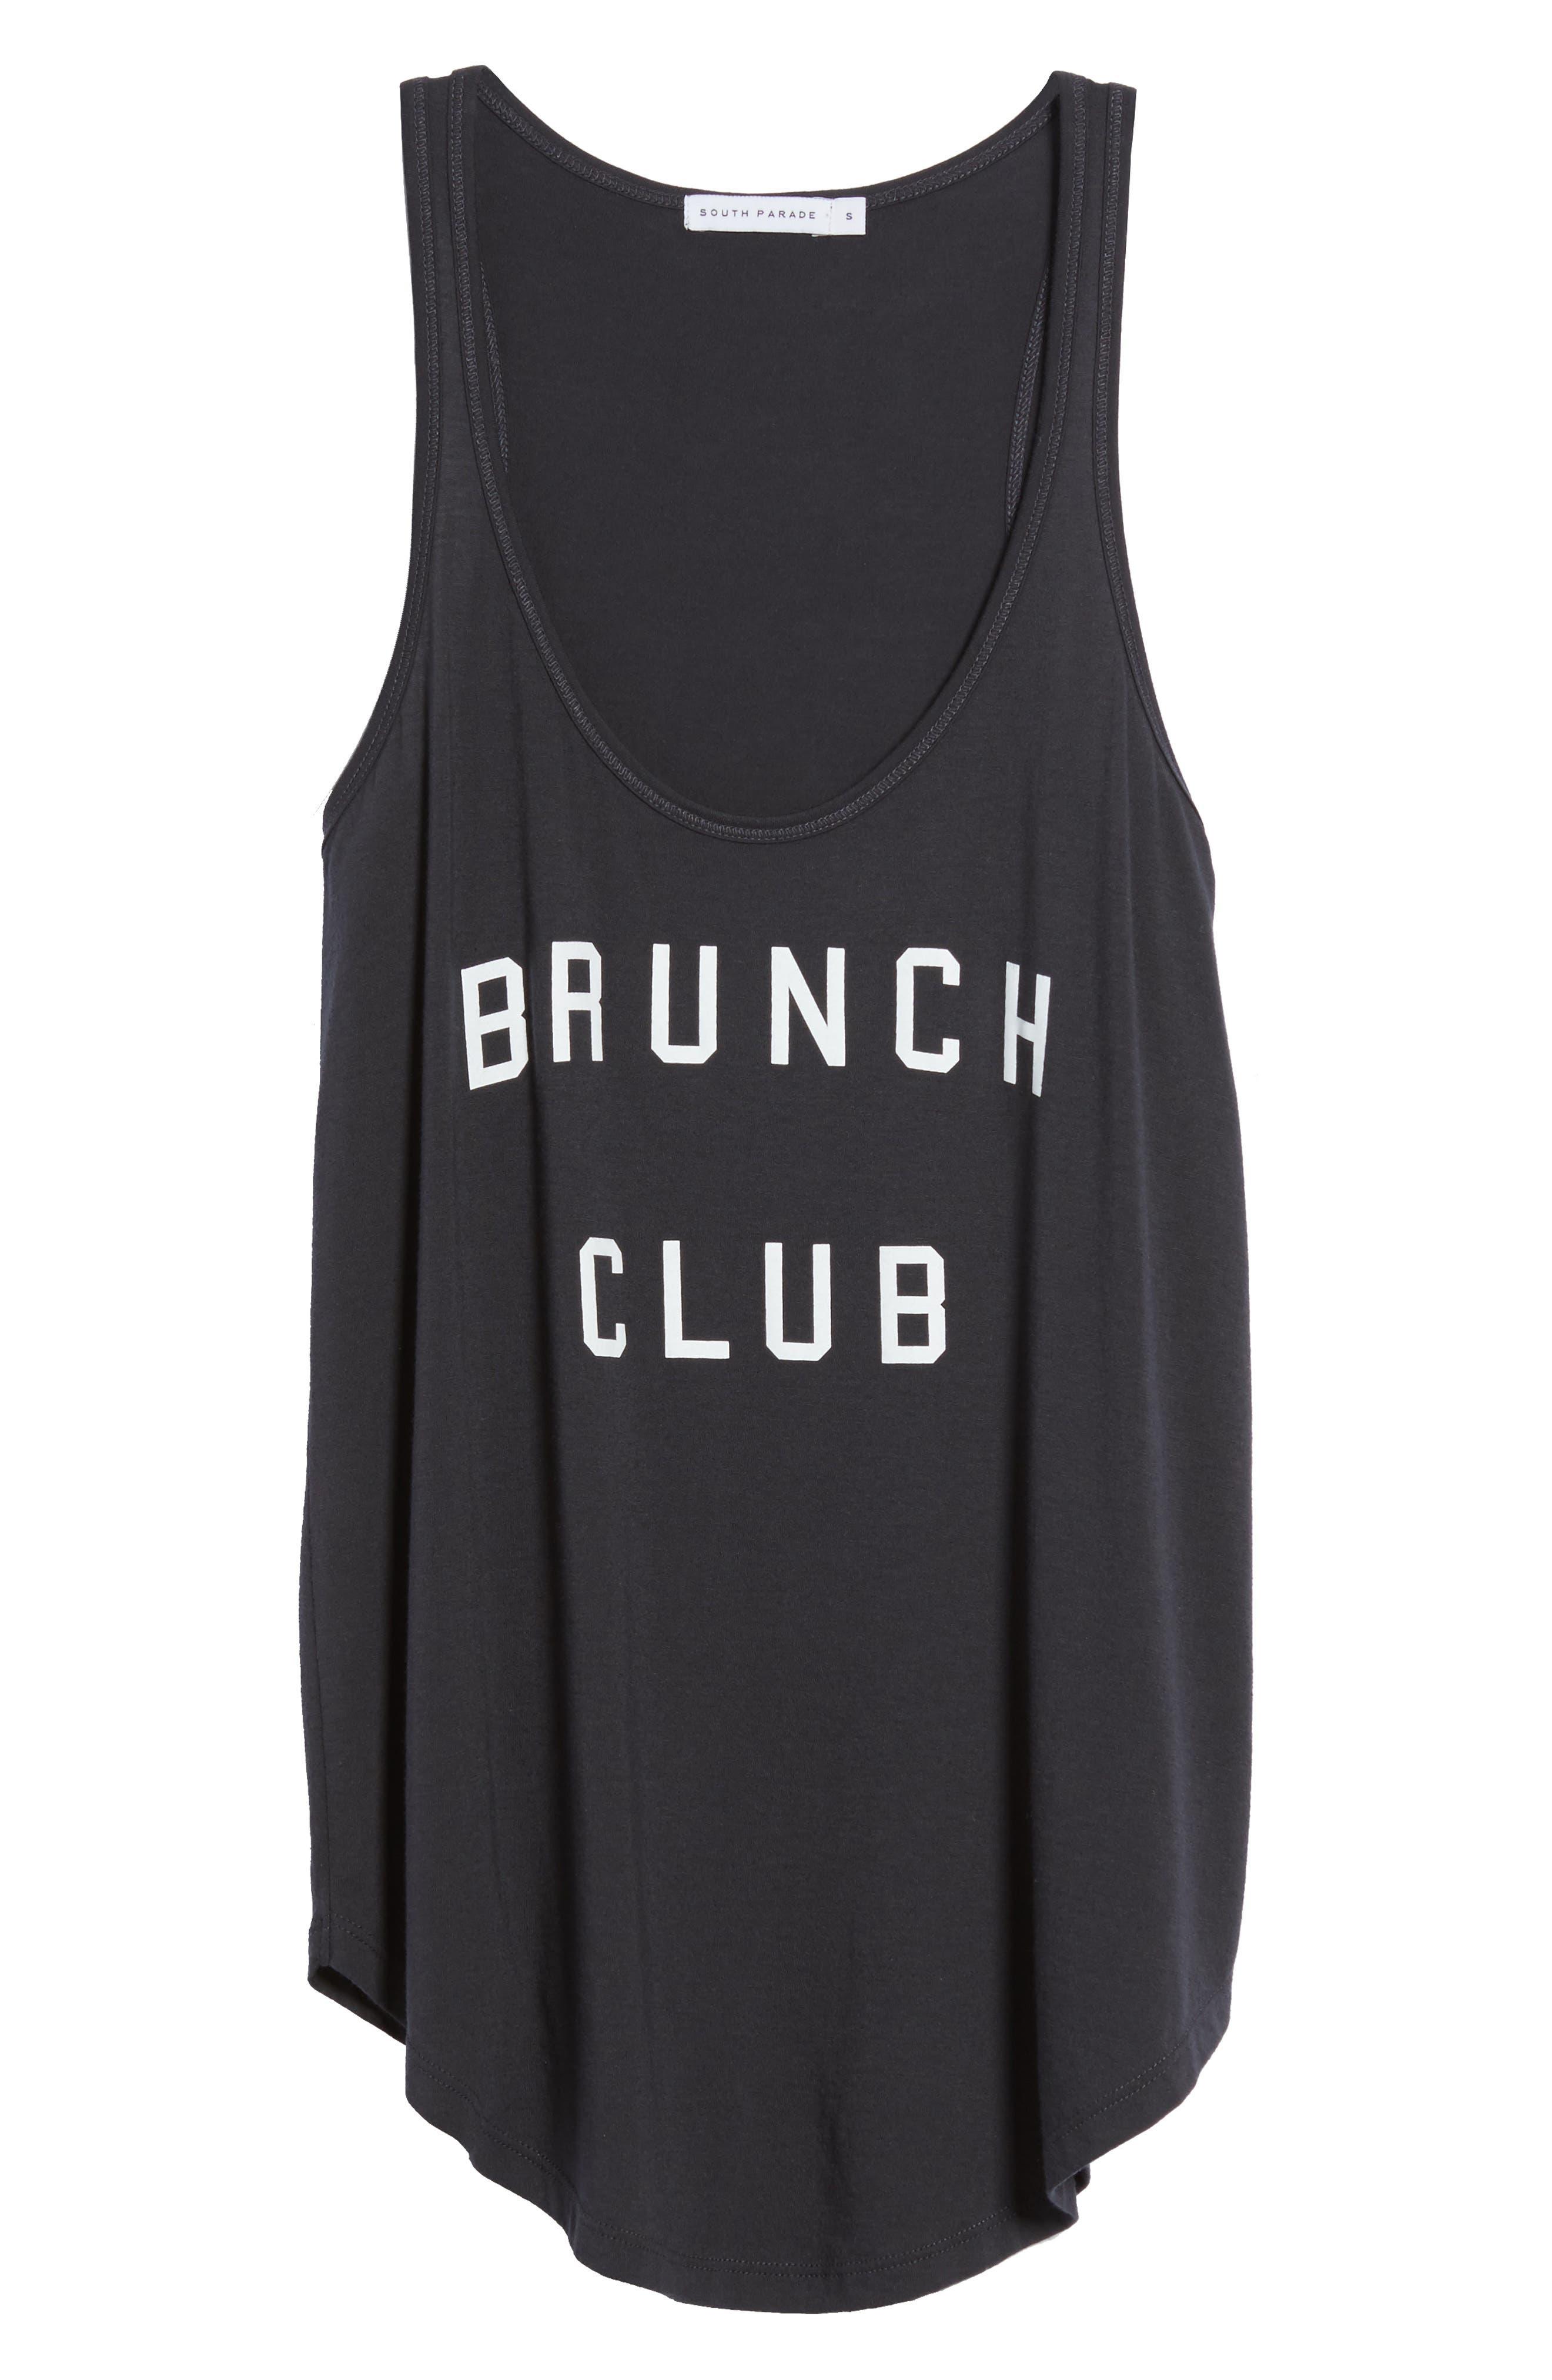 Brunch Club Tank,                             Alternate thumbnail 6, color,                             001